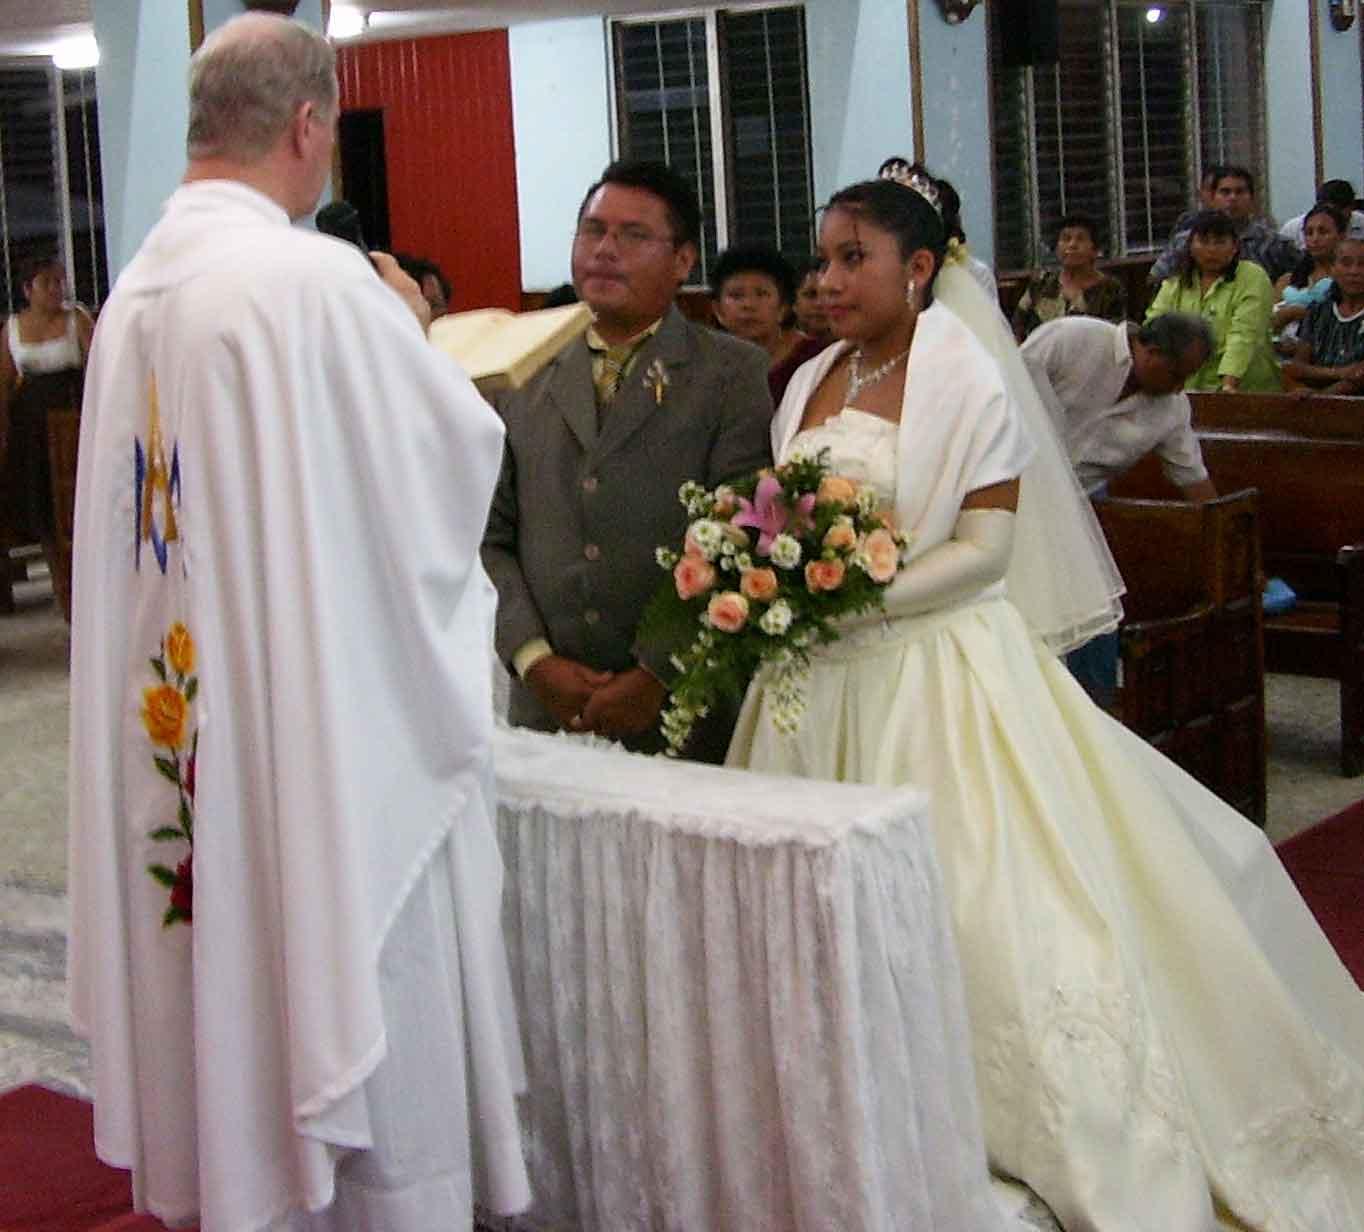 Matrimonio Catolico Dibujo : Parroquia sagrada familia el sacramento del matrimonio